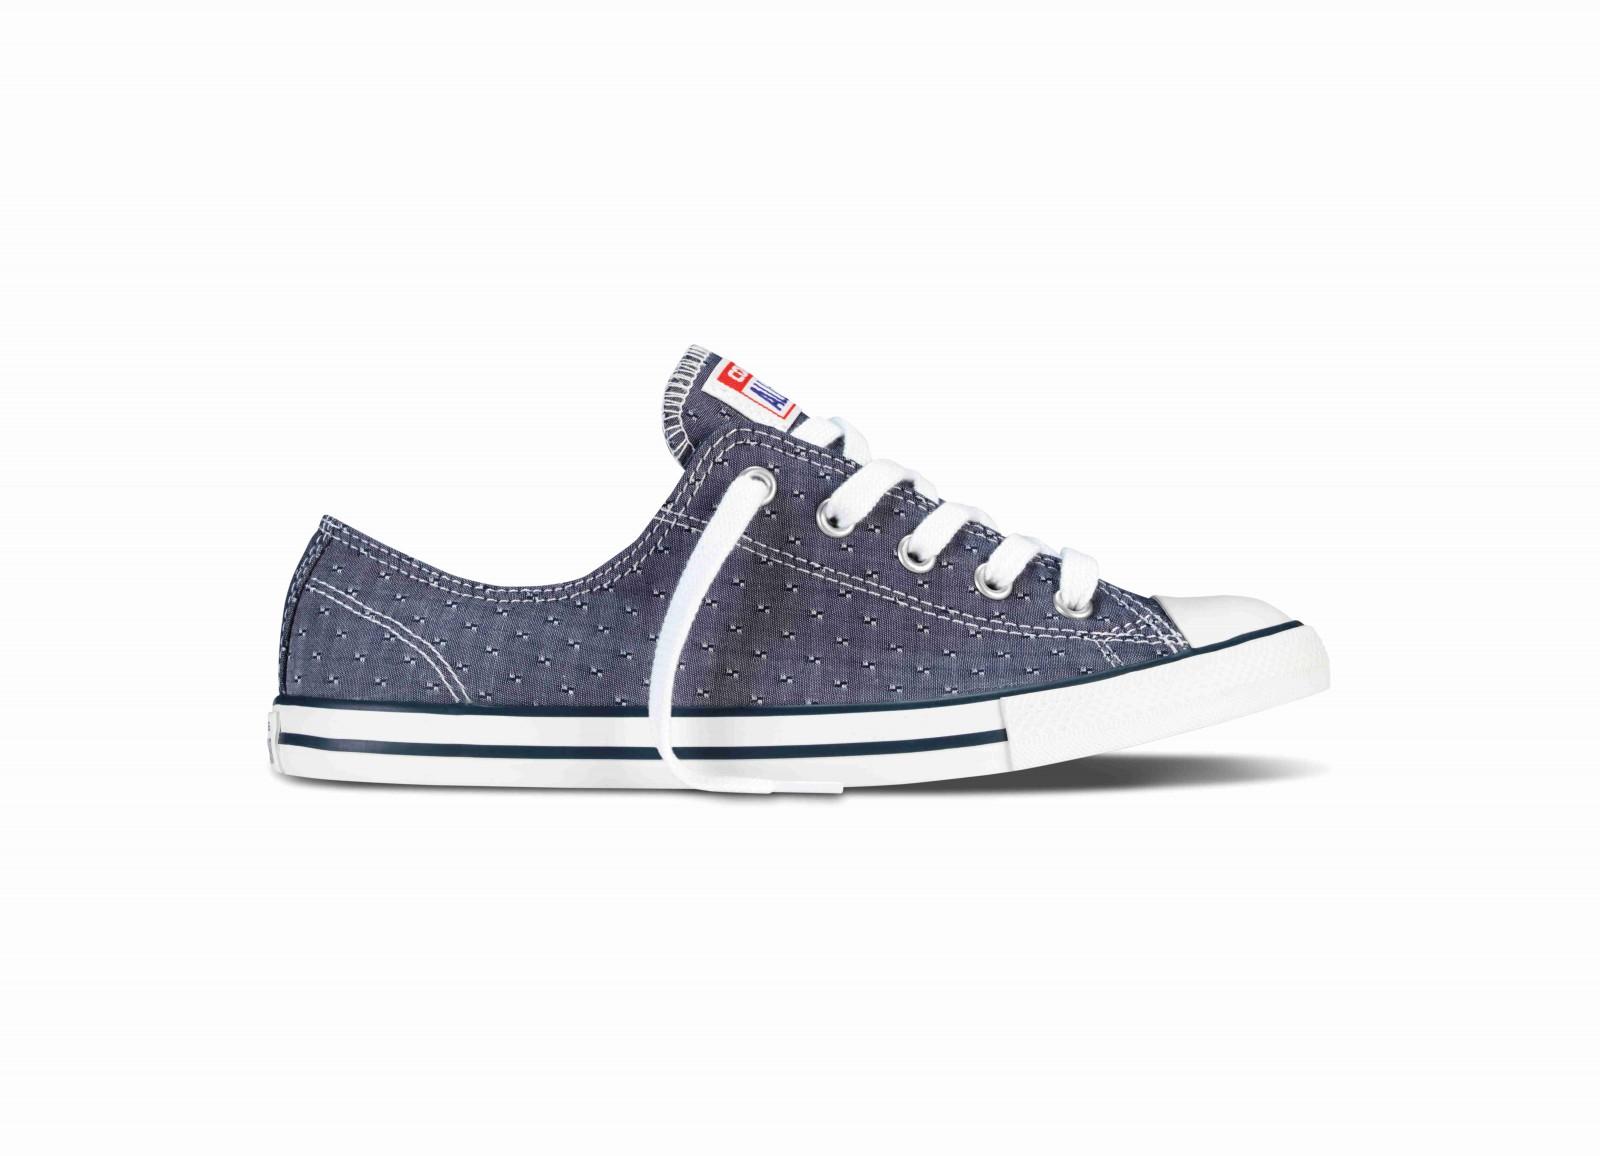 Dámské boty Converse Chuck Taylor All Star Dainty modré  82ee87de64d